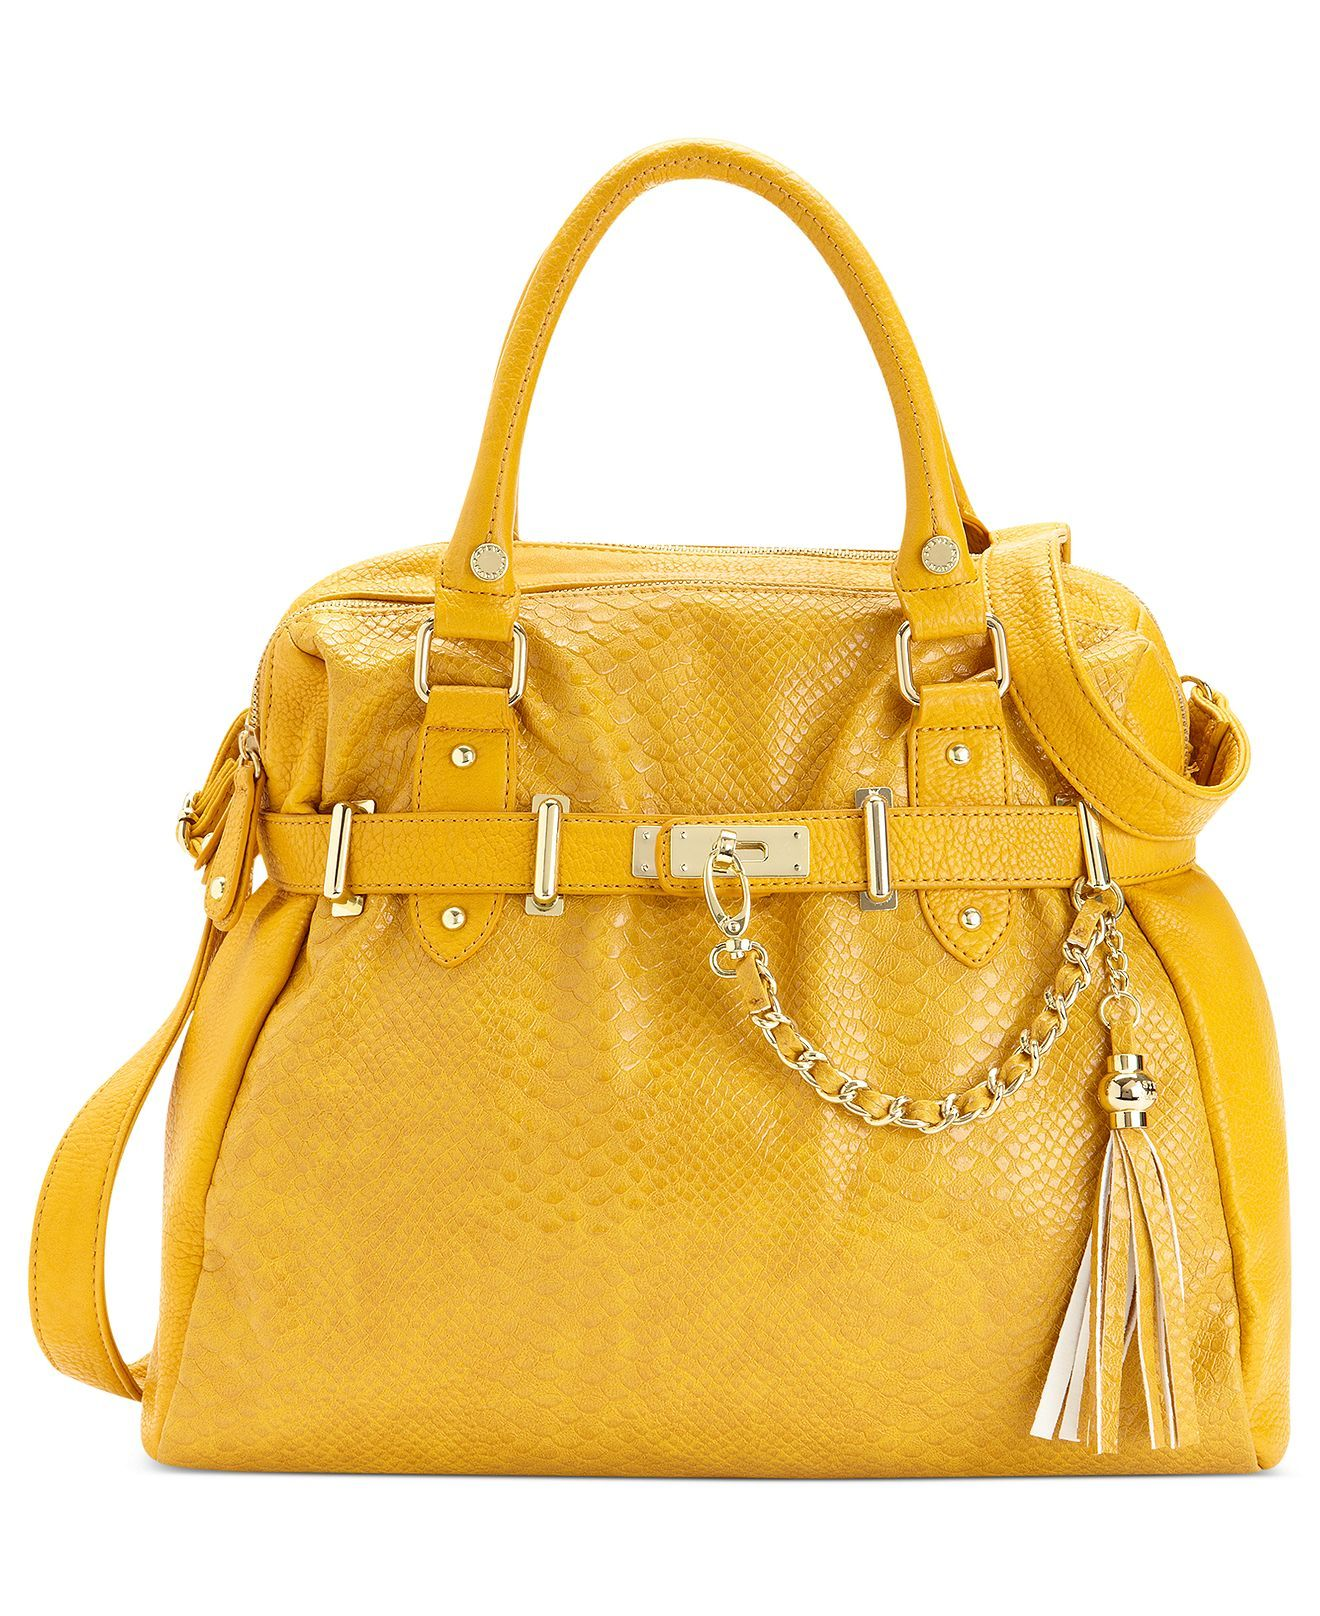 Steve madden handbag bnancy snake satchel sale for Macy s jewelry clearance